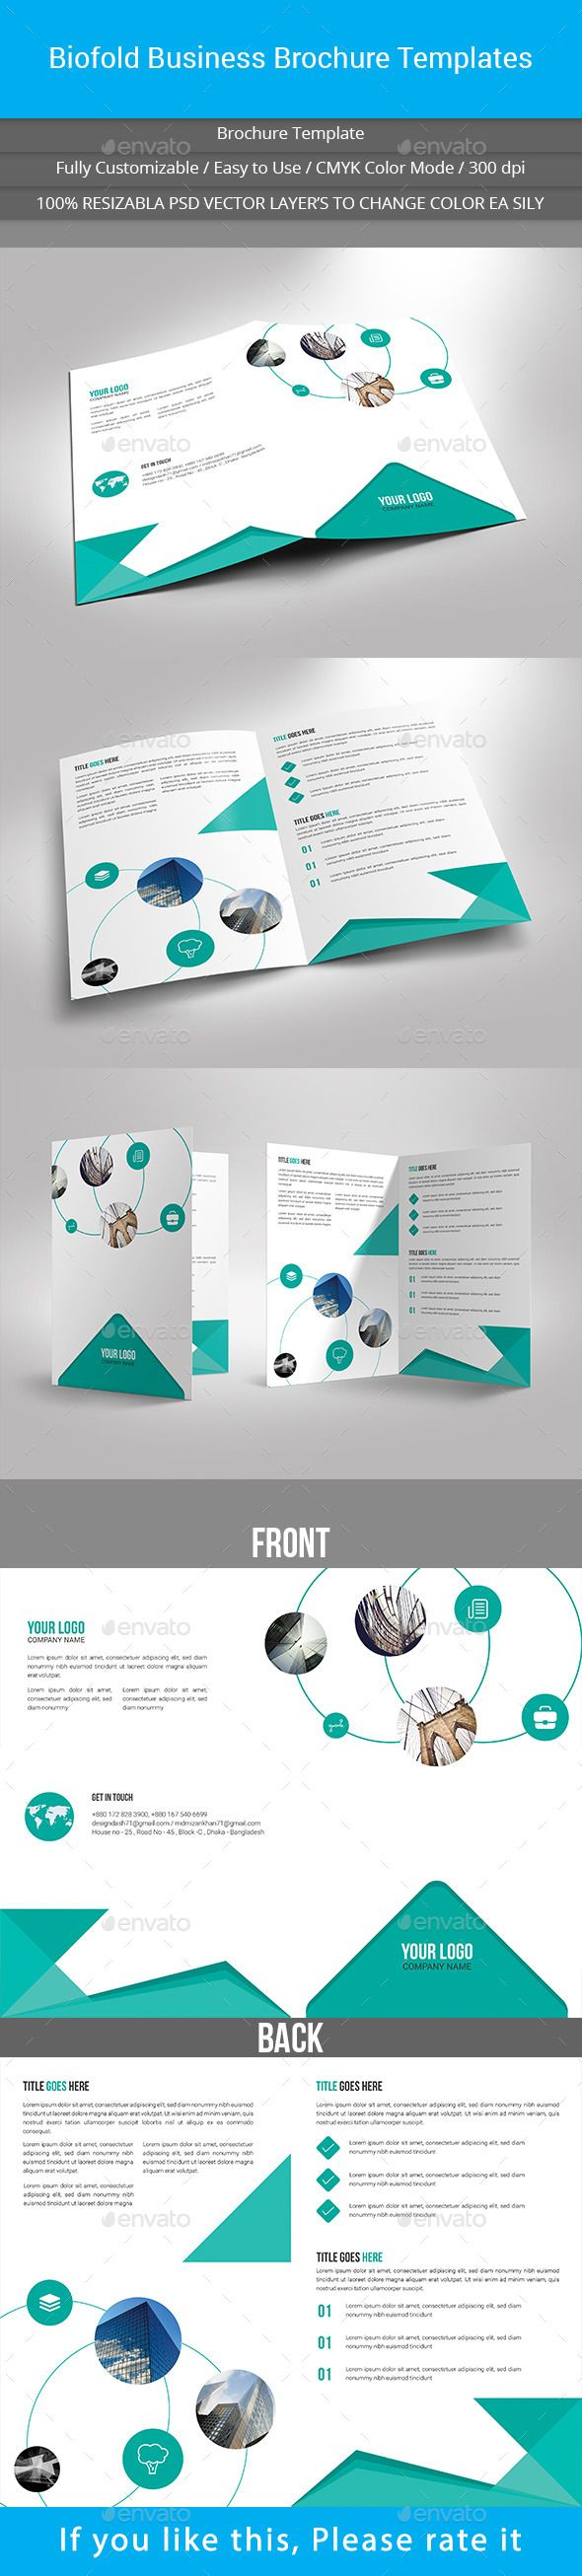 Biofold Business Brochure Templates Business Brochure Brochure